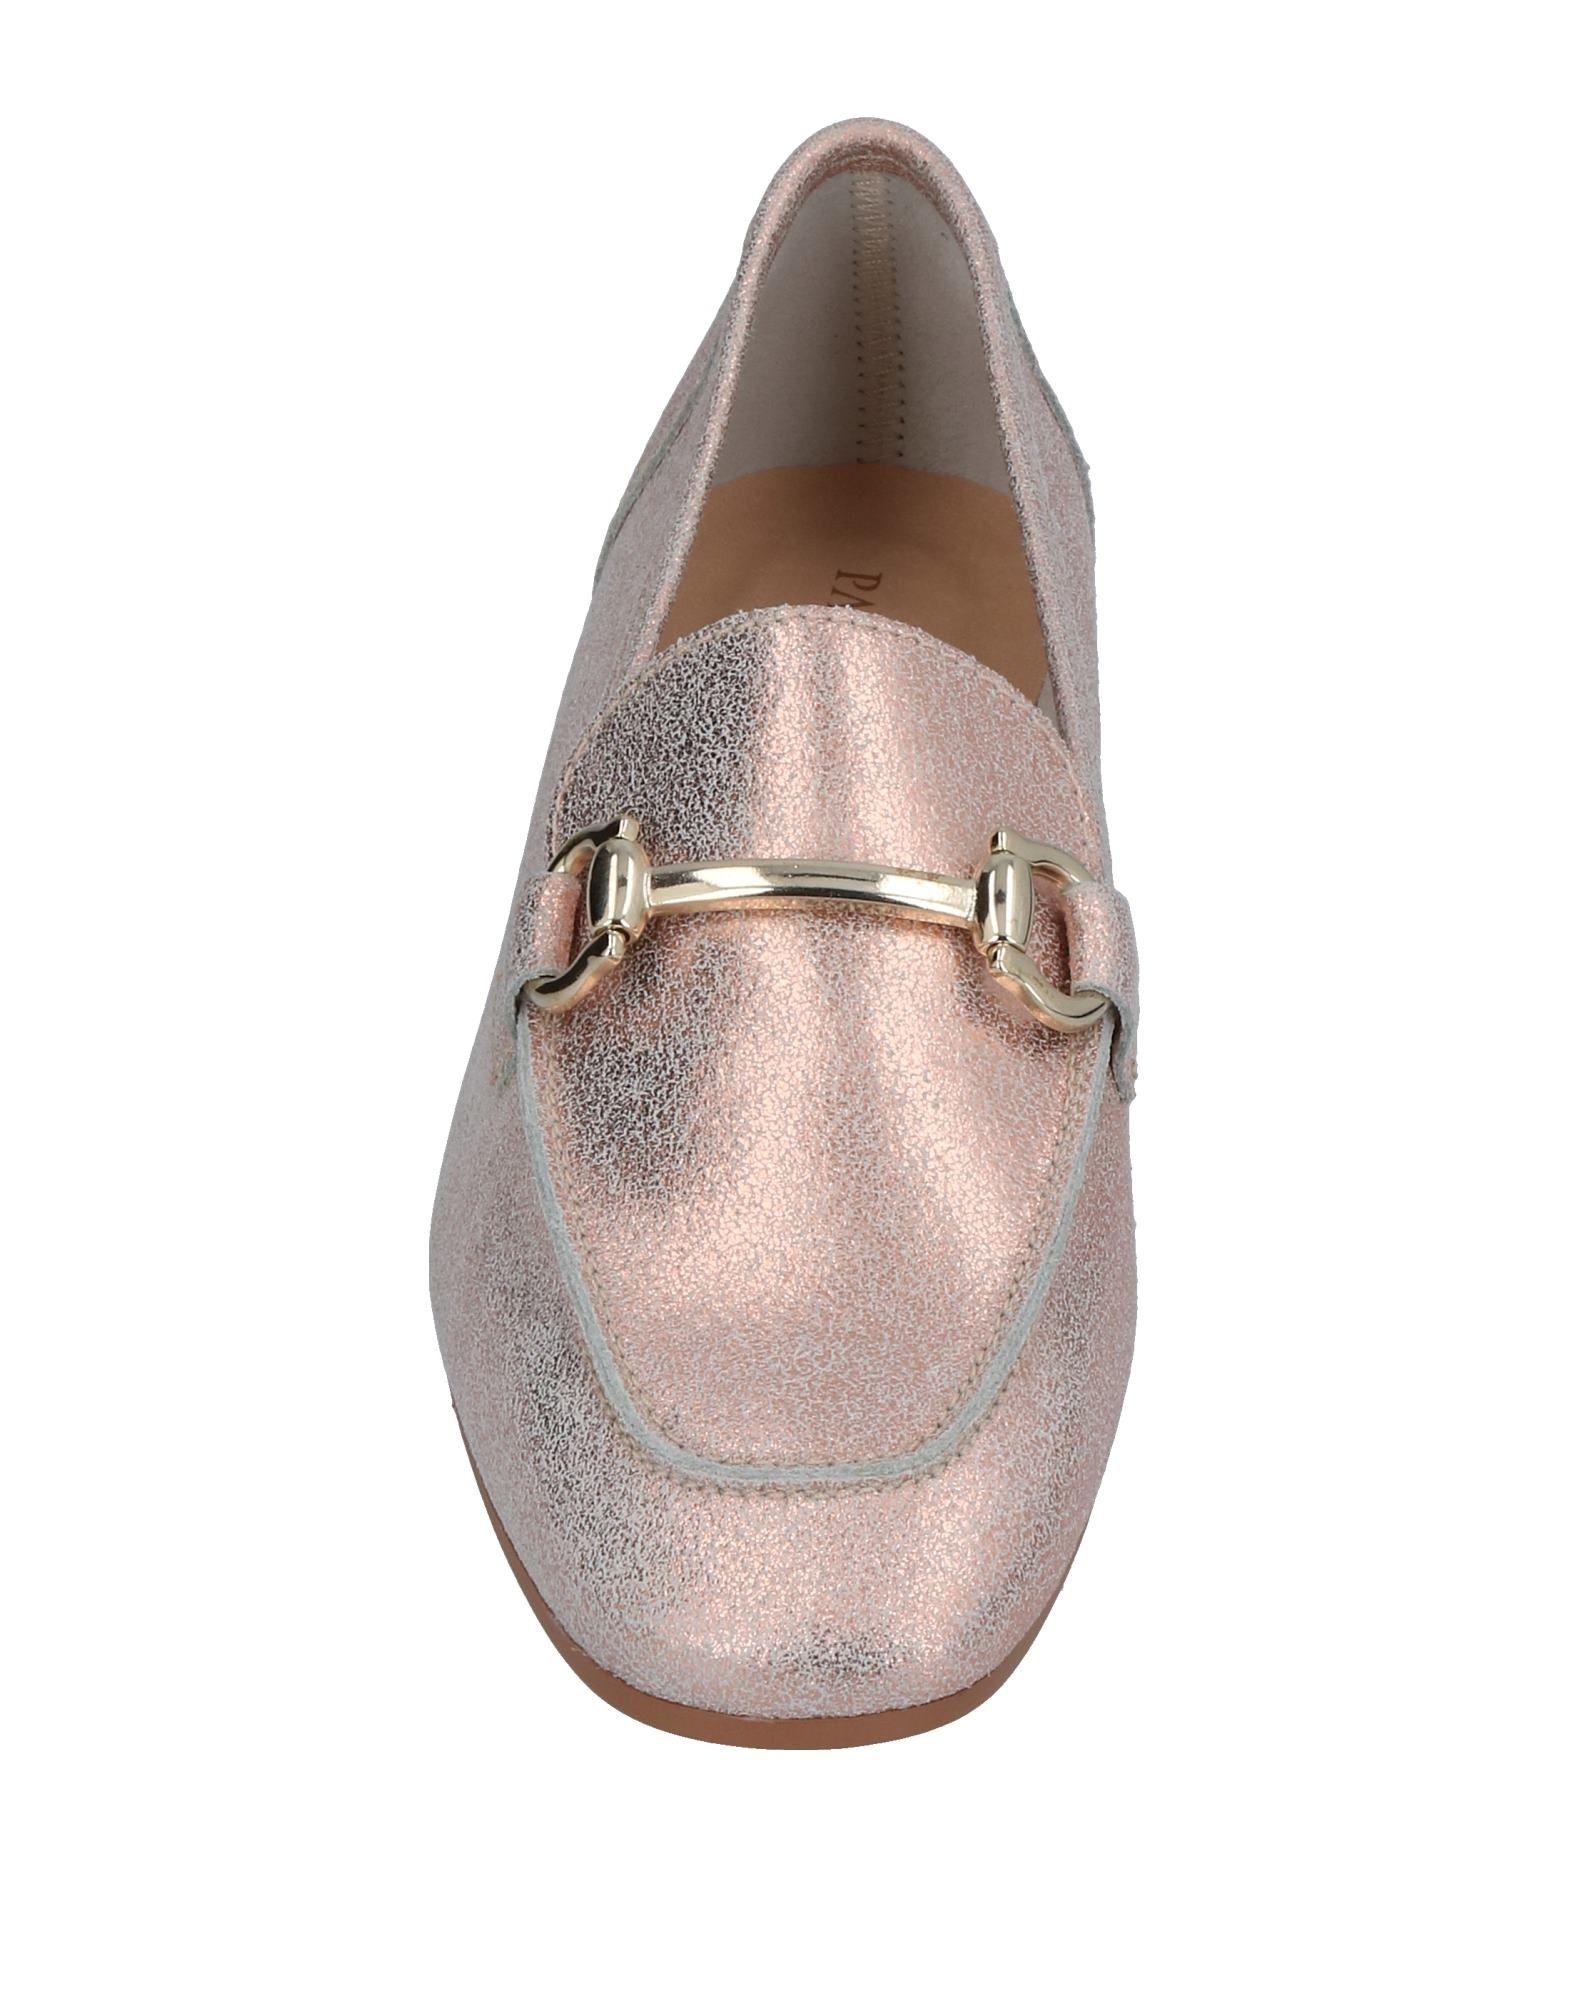 Carlo Pazolini Mokassins Damen    11407748VL Neue Schuhe 59a1cf